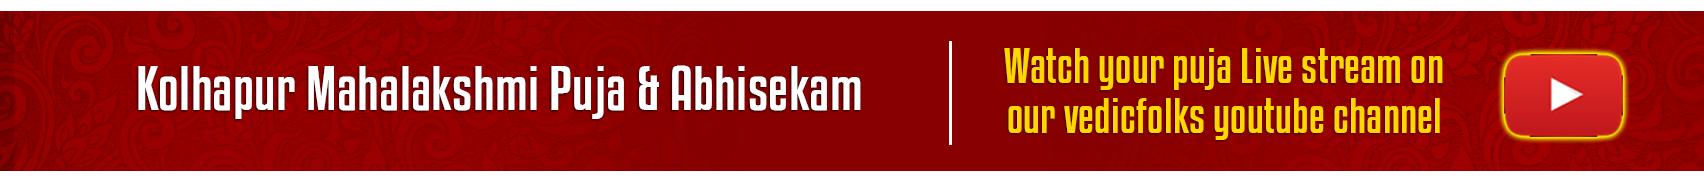 Kolhapur Mahalakshmi Puja Youtube link